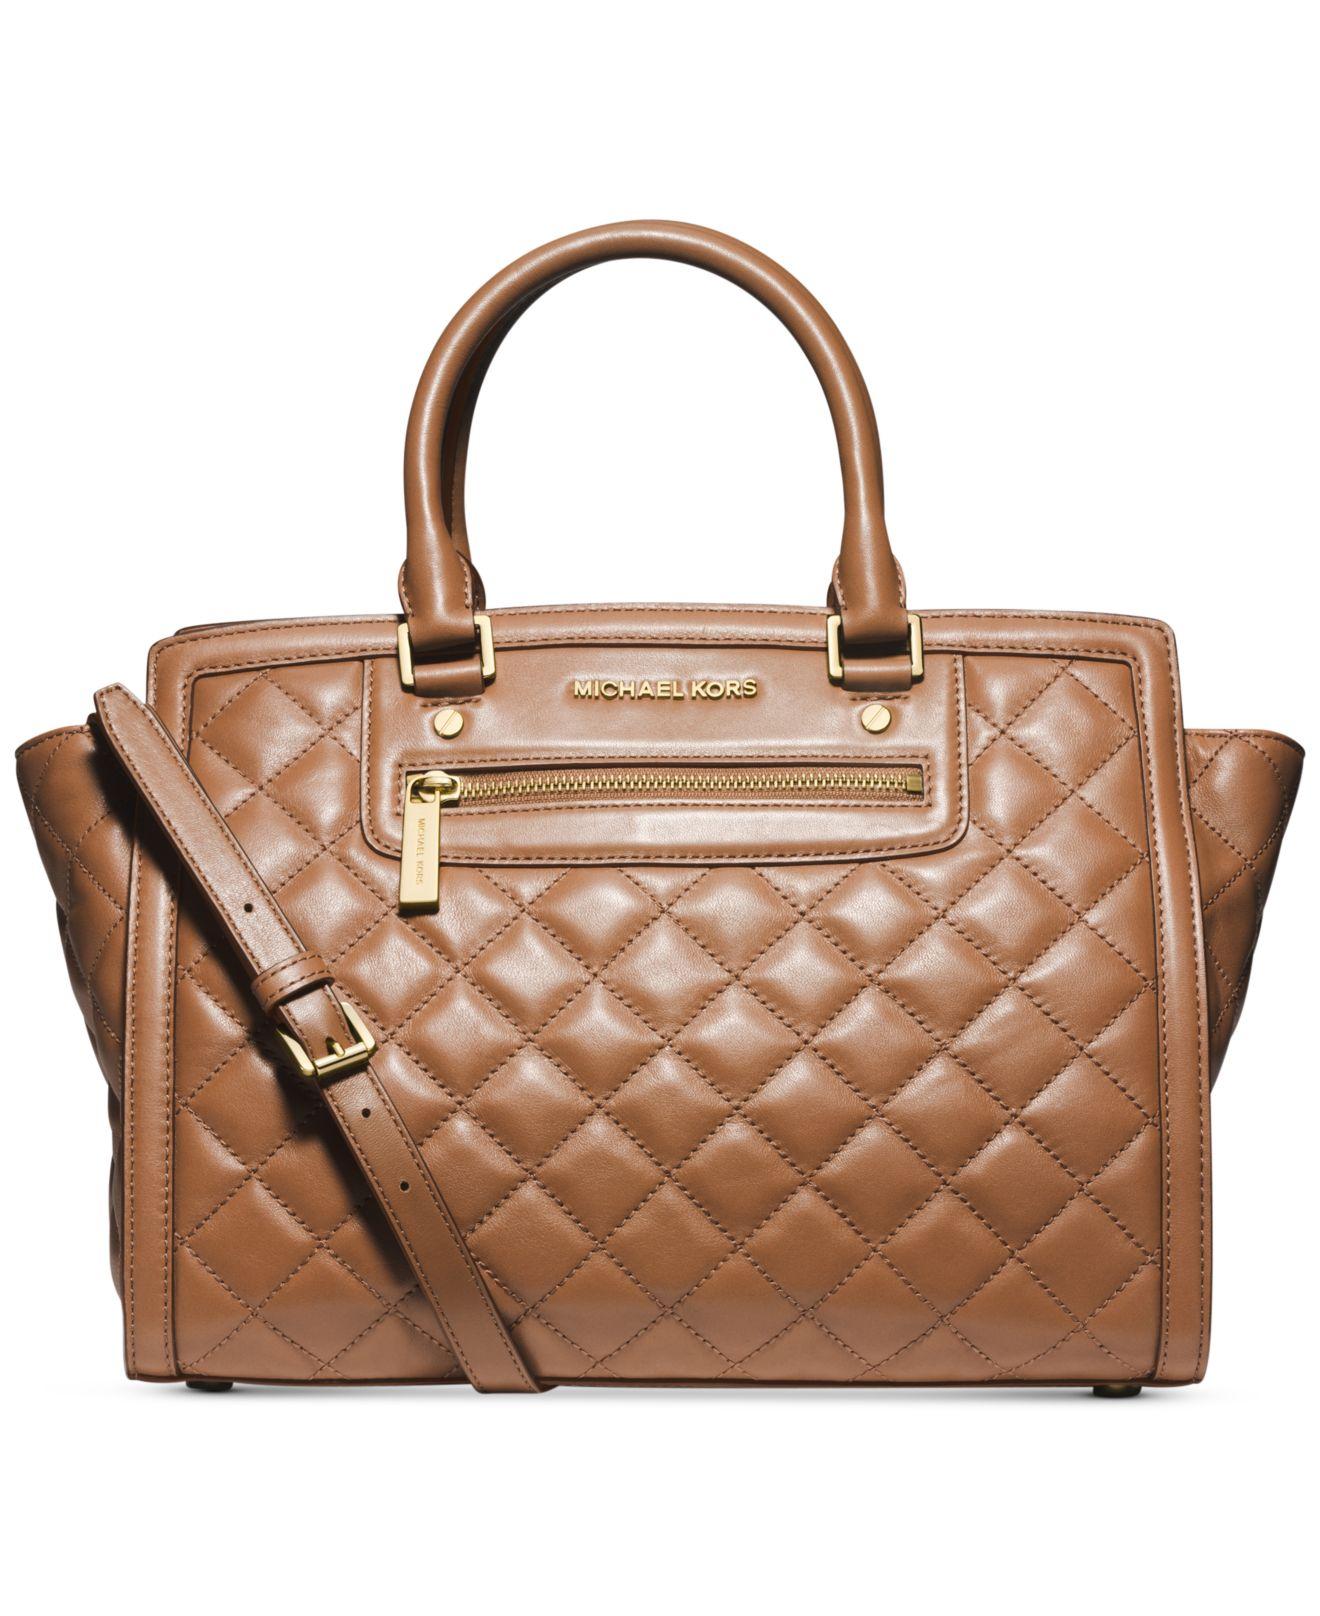 michael kors michael selma zip quilt large satchel in. Black Bedroom Furniture Sets. Home Design Ideas